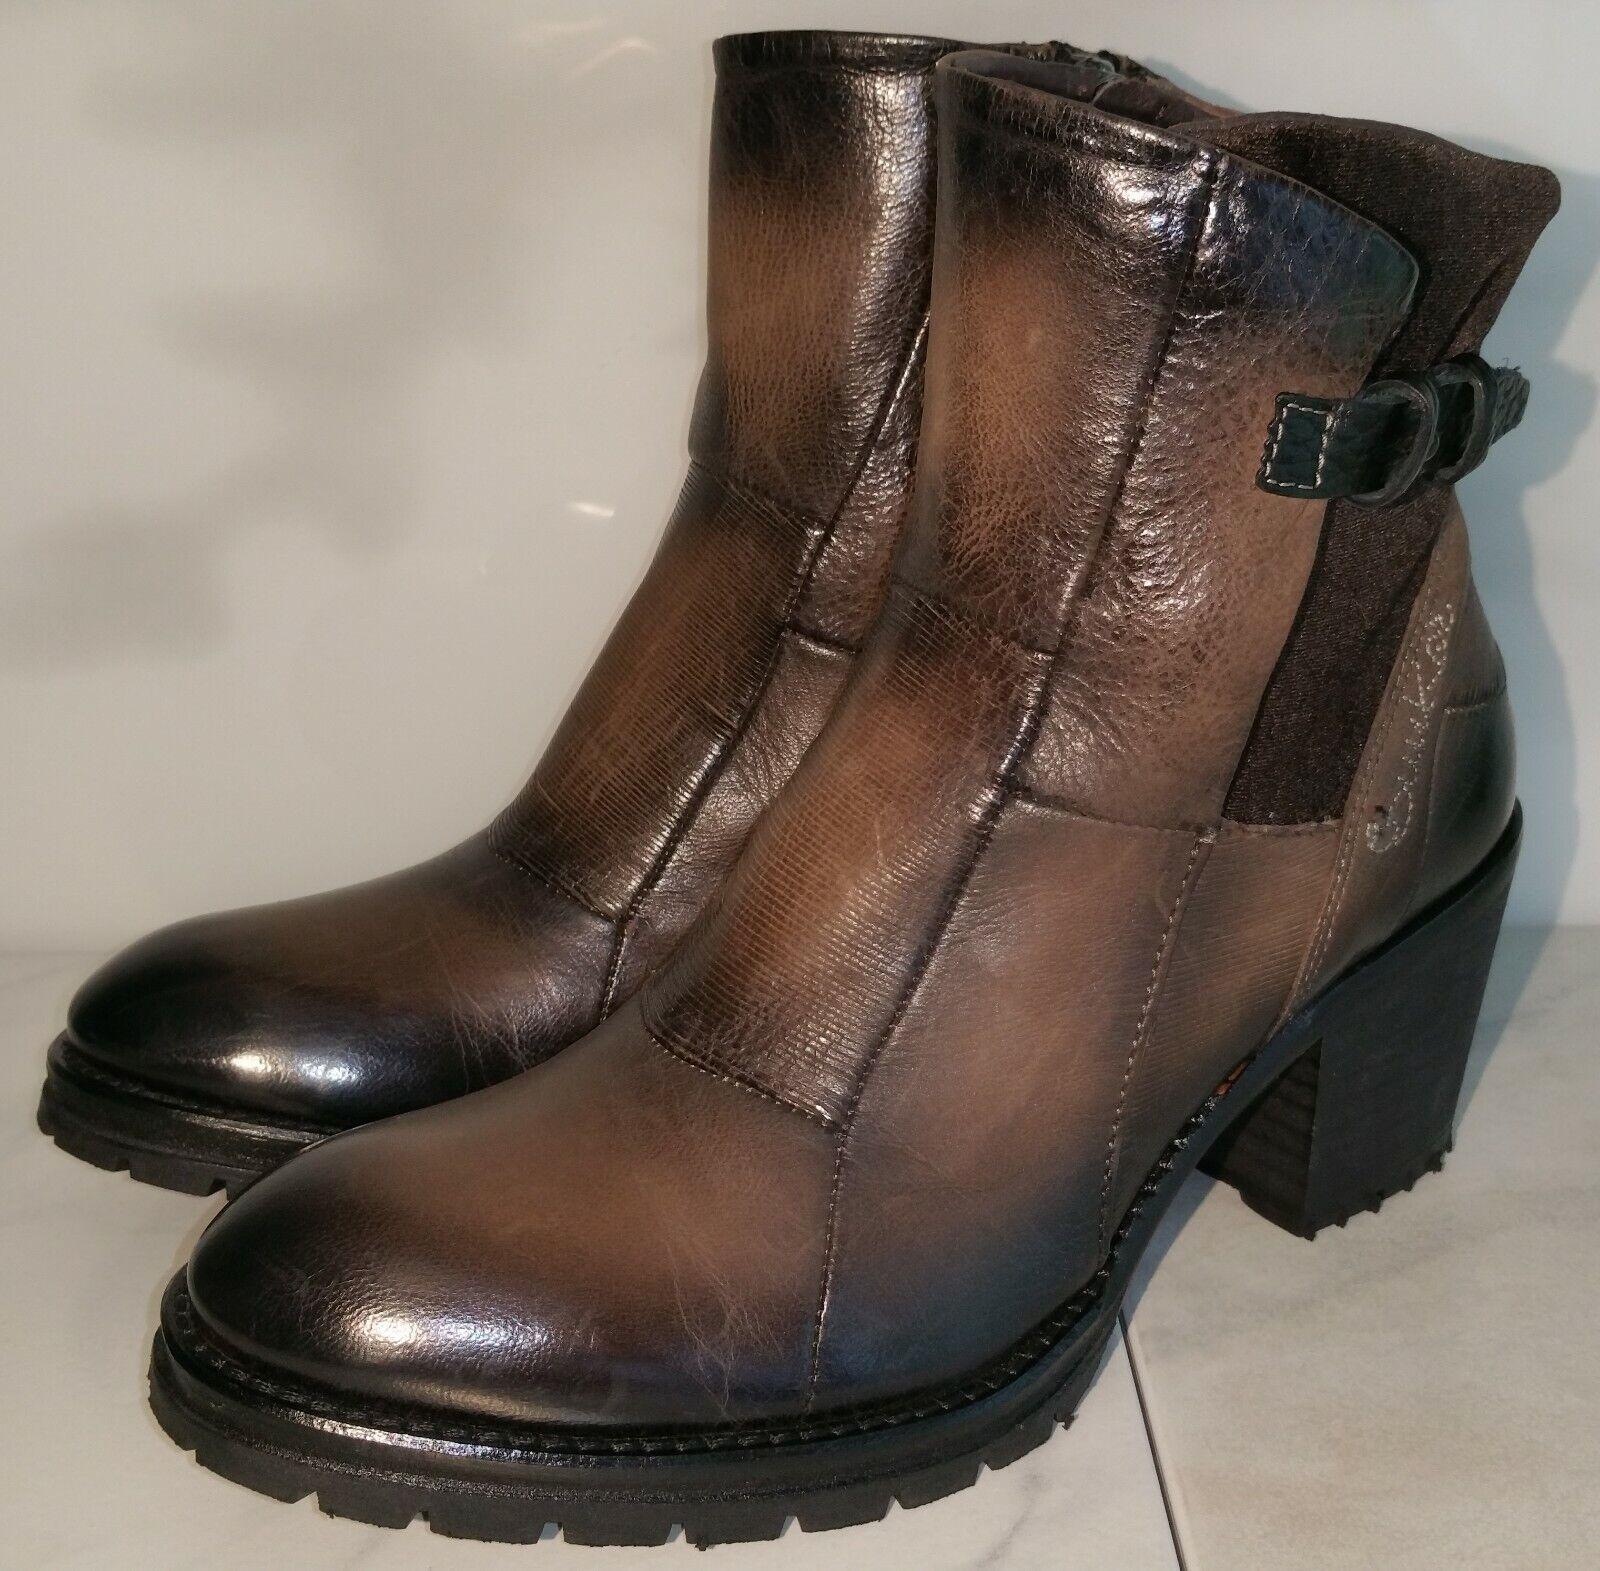 NEU BUNKER 37 PATCH-NB29 Stiefeletten Stiefel Stiefel Schuhe Leder braun Echtleder